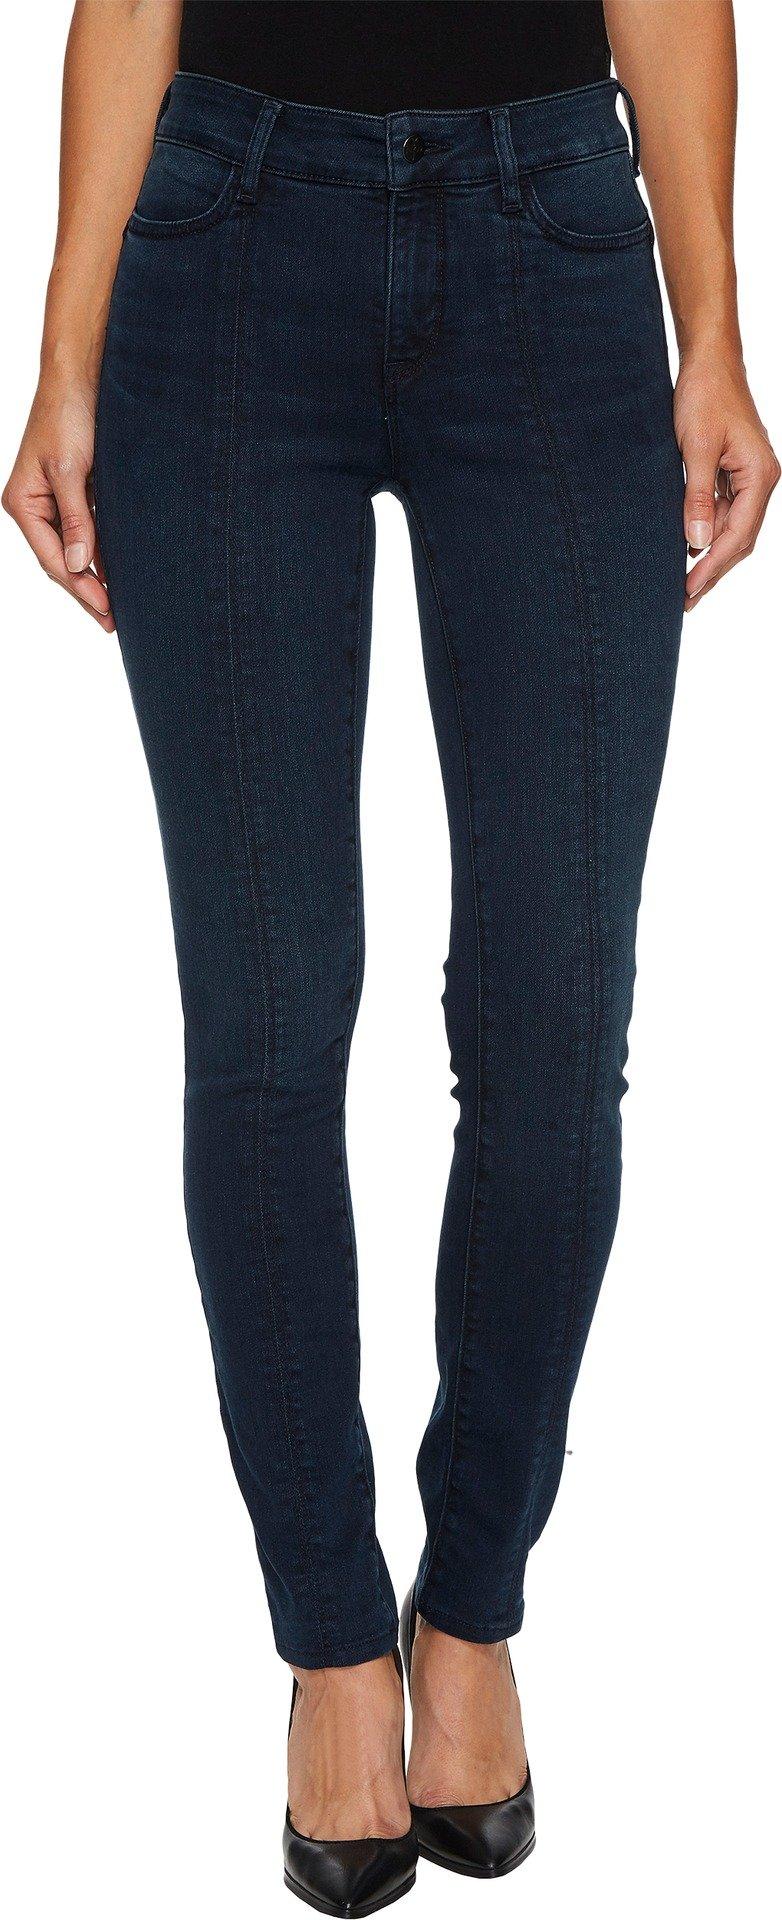 NYDJ Women's Uplift Alina Skinny Jeans in Future Fit Denim, Mason with Panneling, 10